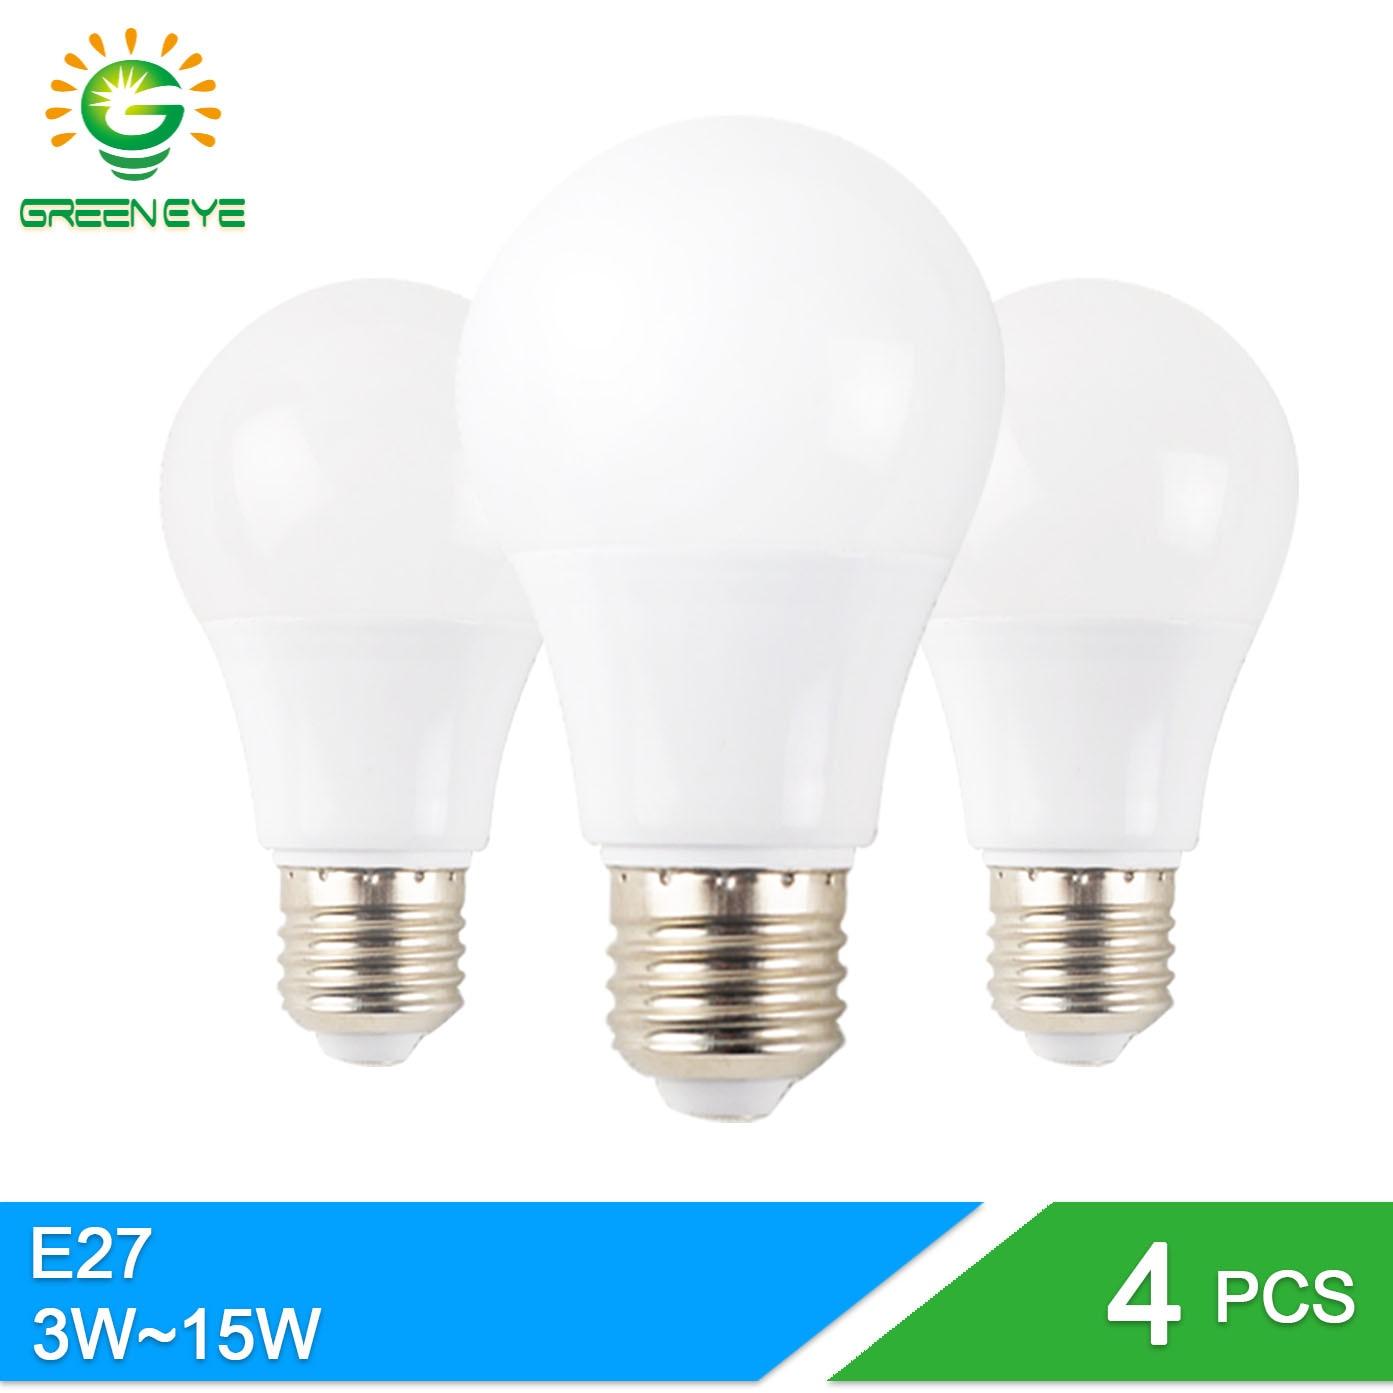 GreenEye-4pcs-High-Grade-A-font-b-Led-b-font-font-b-Bulb-b-font-E27 Spannende Gu10 Led 1 Watt Dekorationen